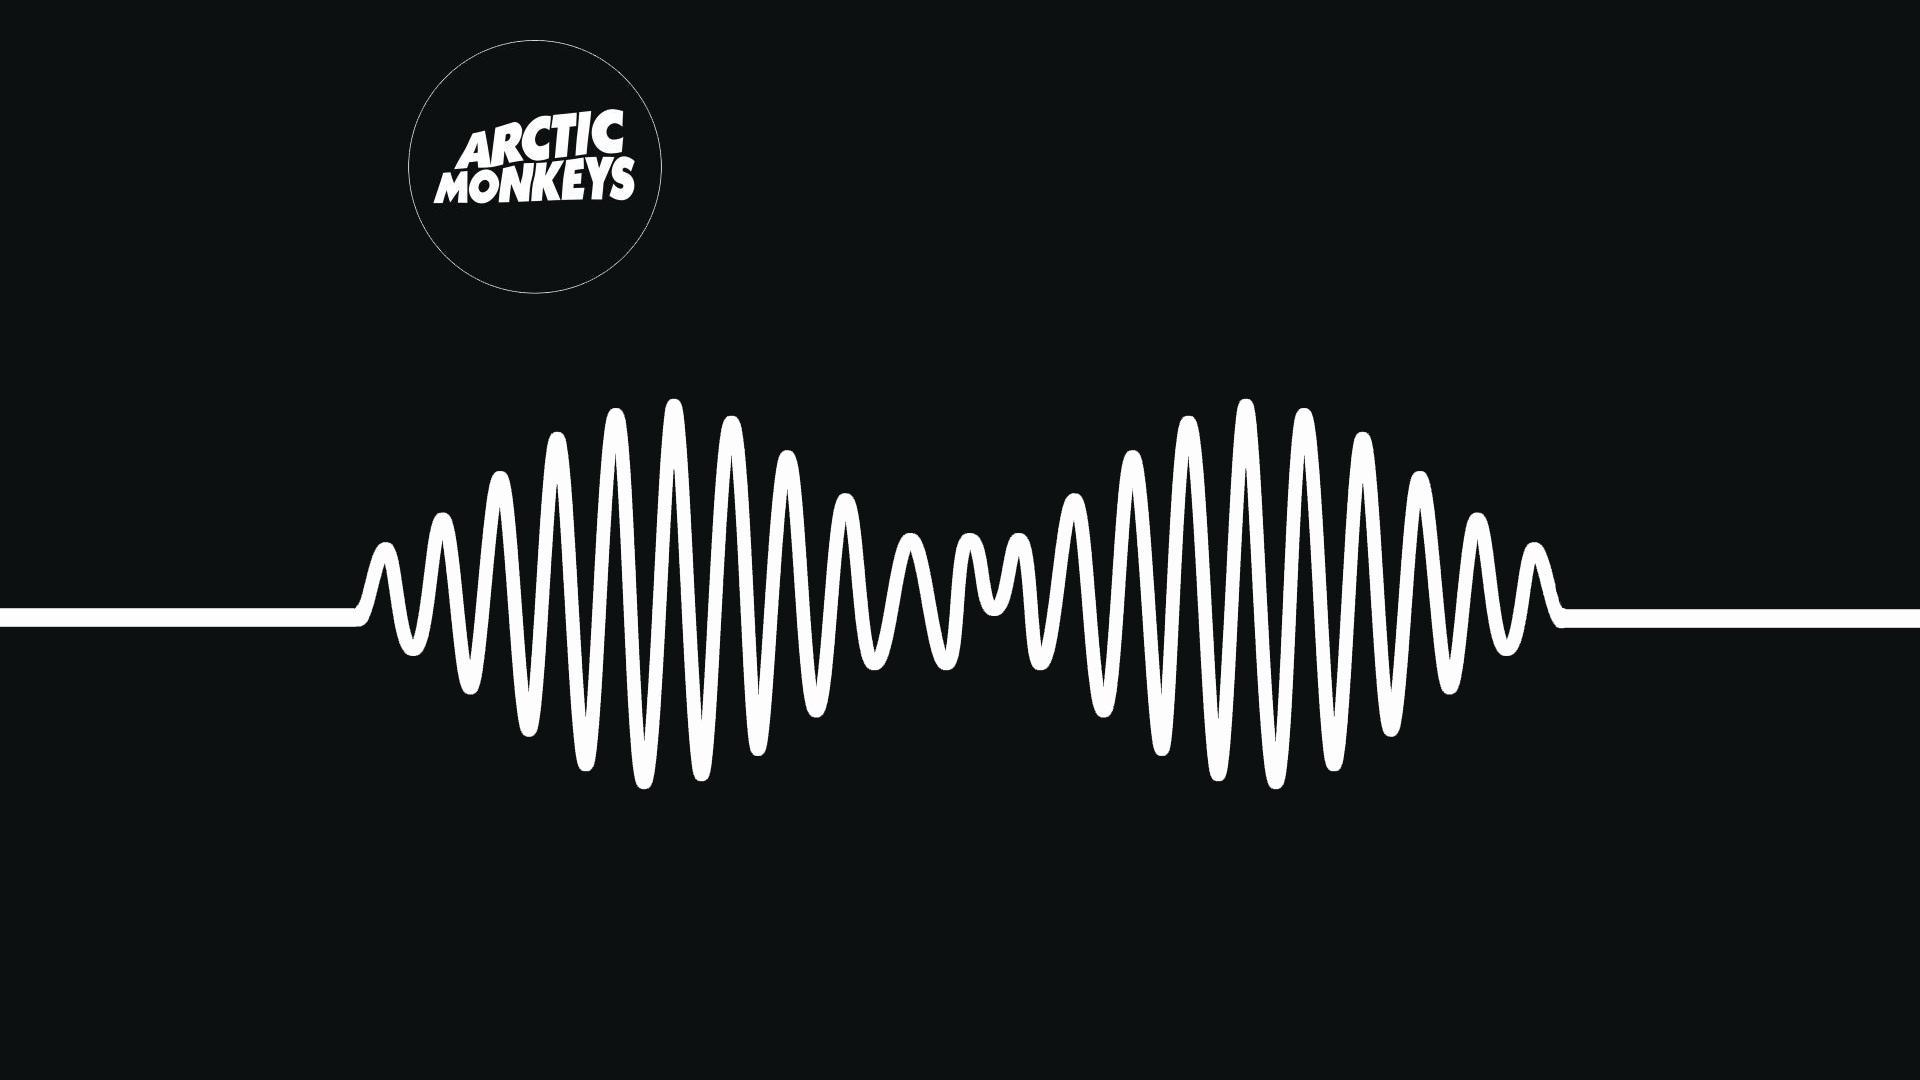 Arctic Monkeys Clipart Iphone.